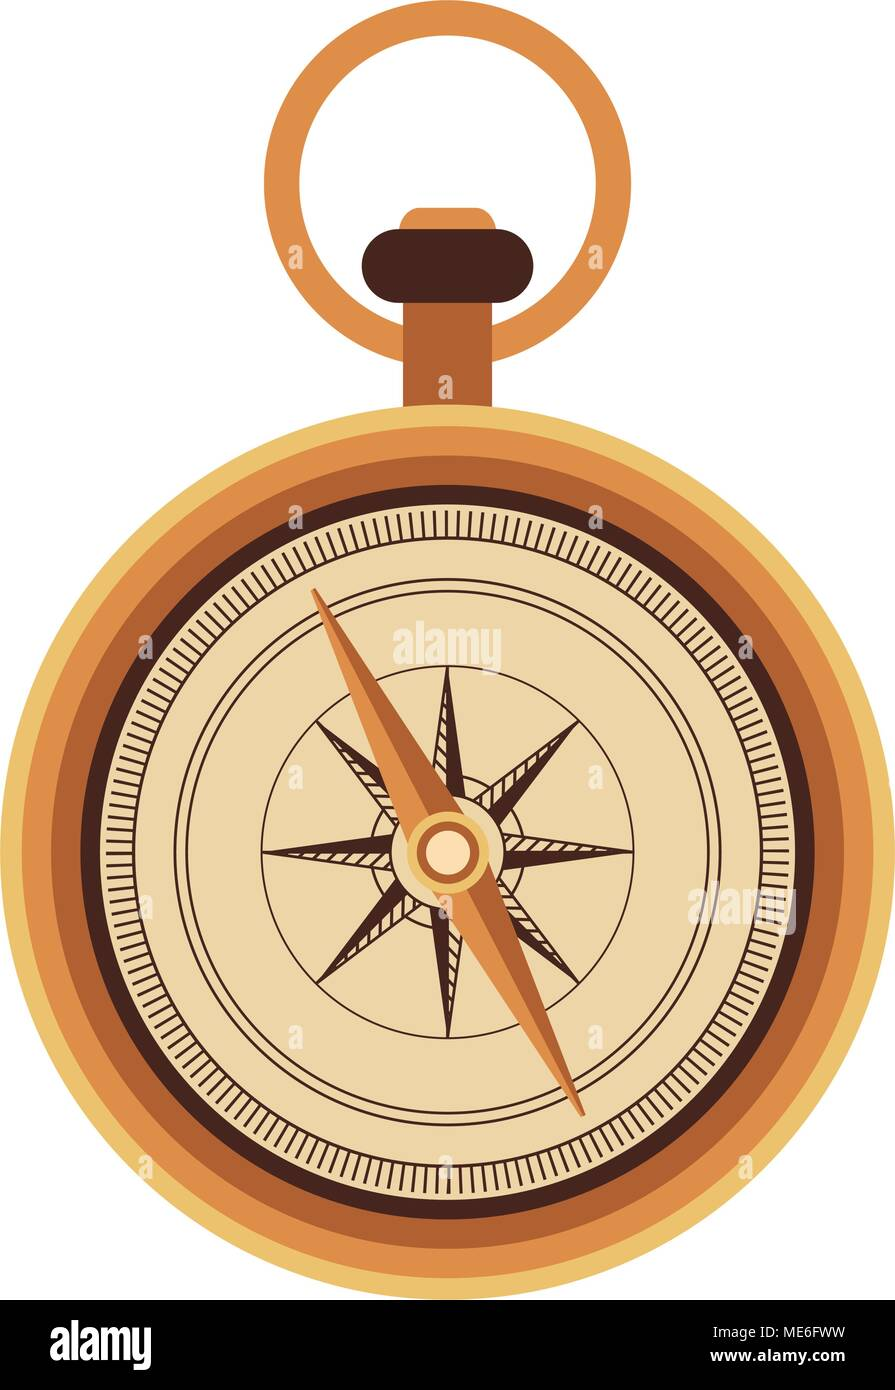 Vintage navigation compass - Stock Image